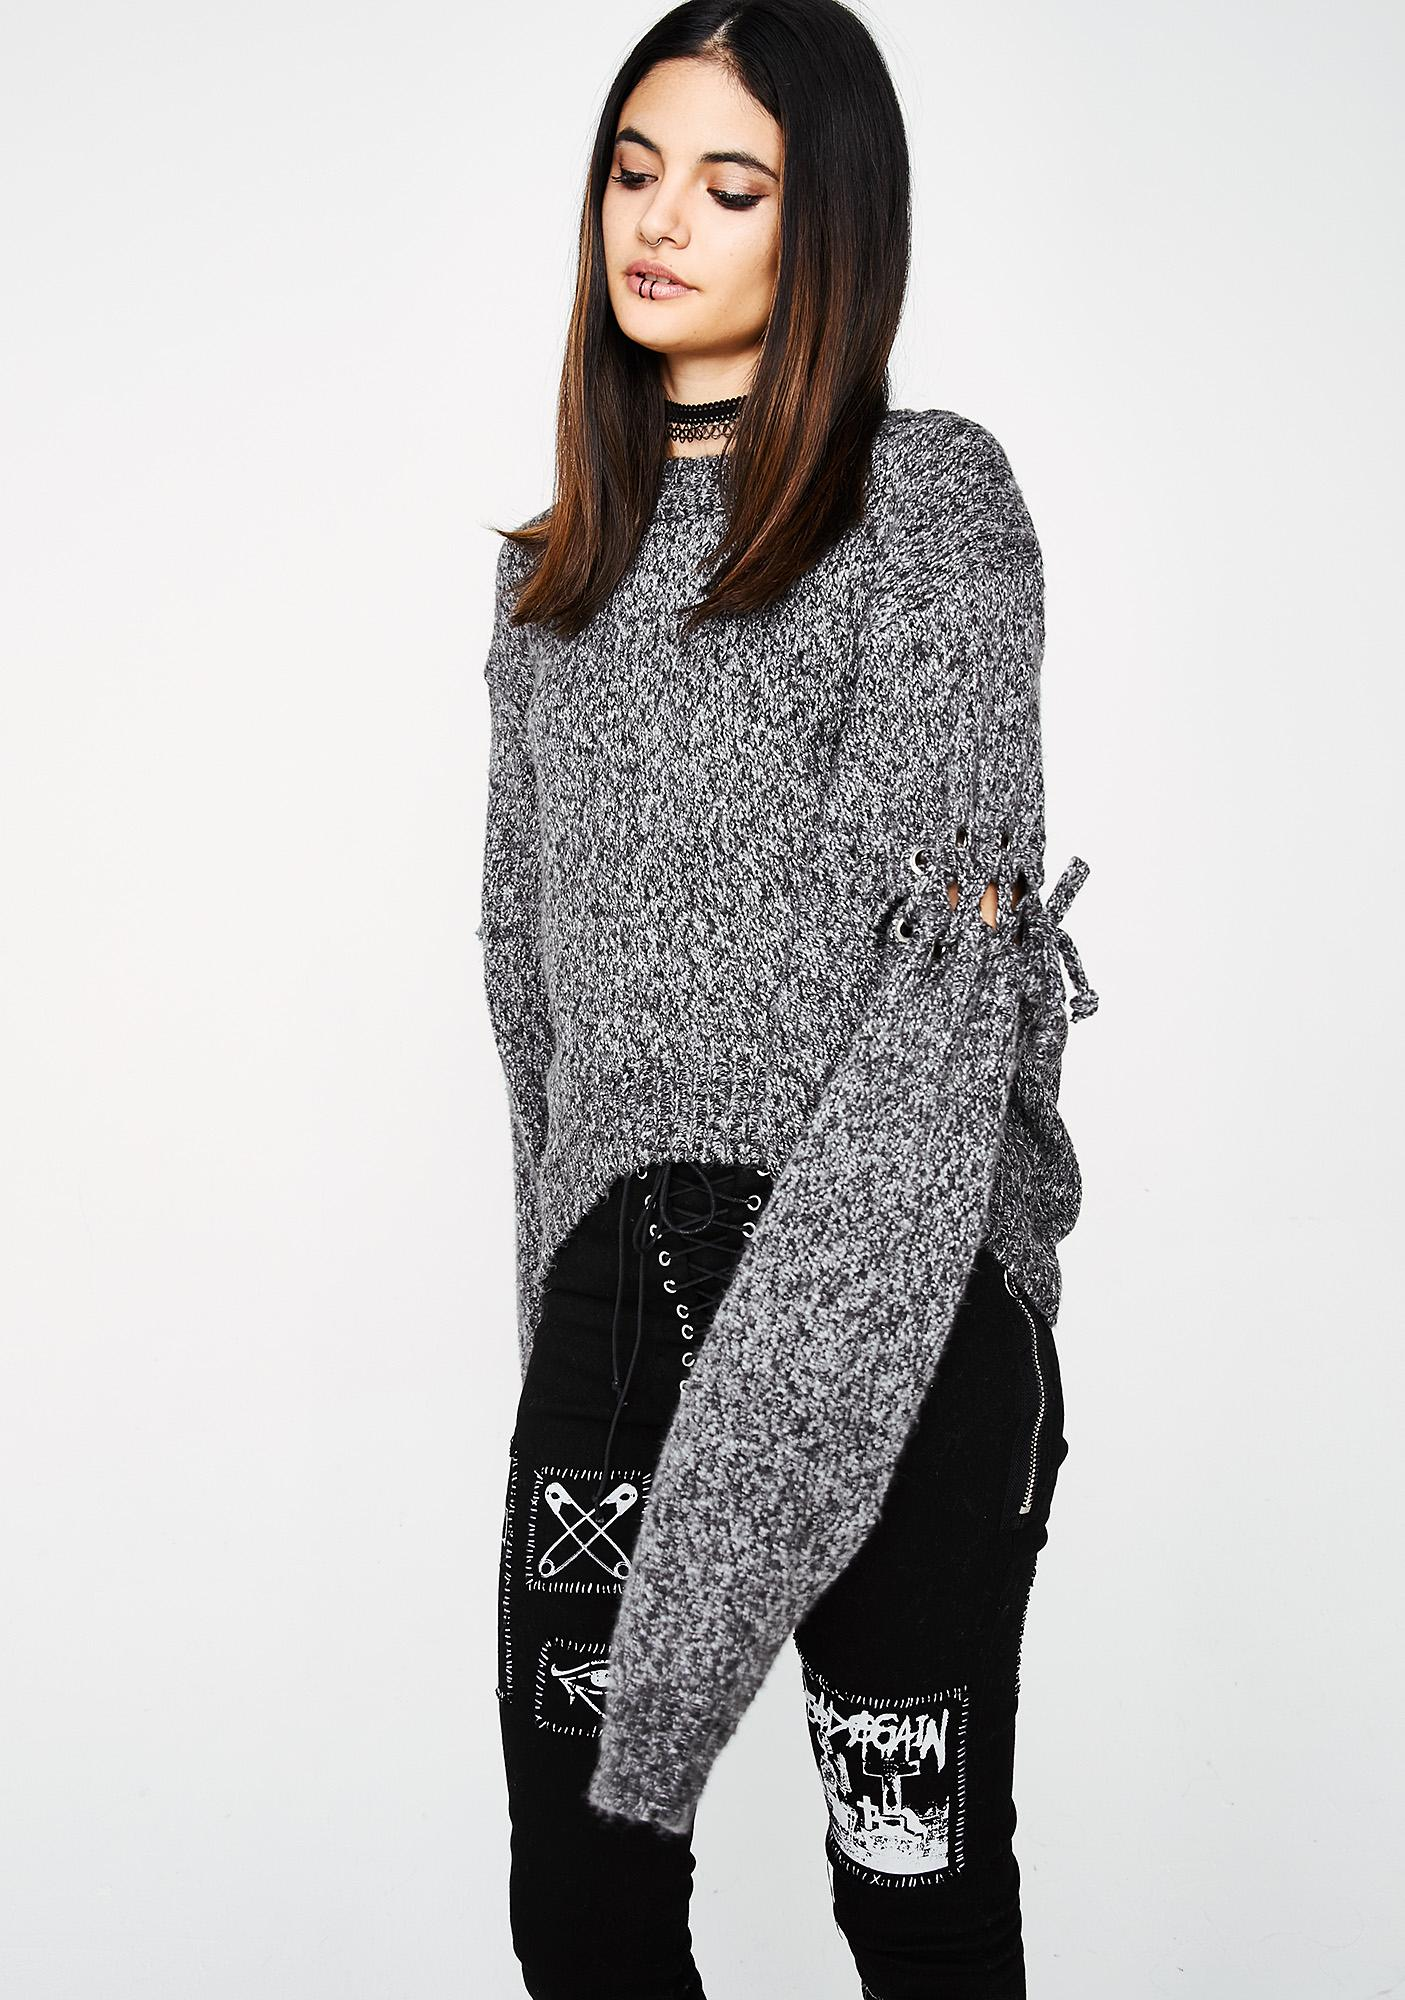 Gloomy Day Sweater